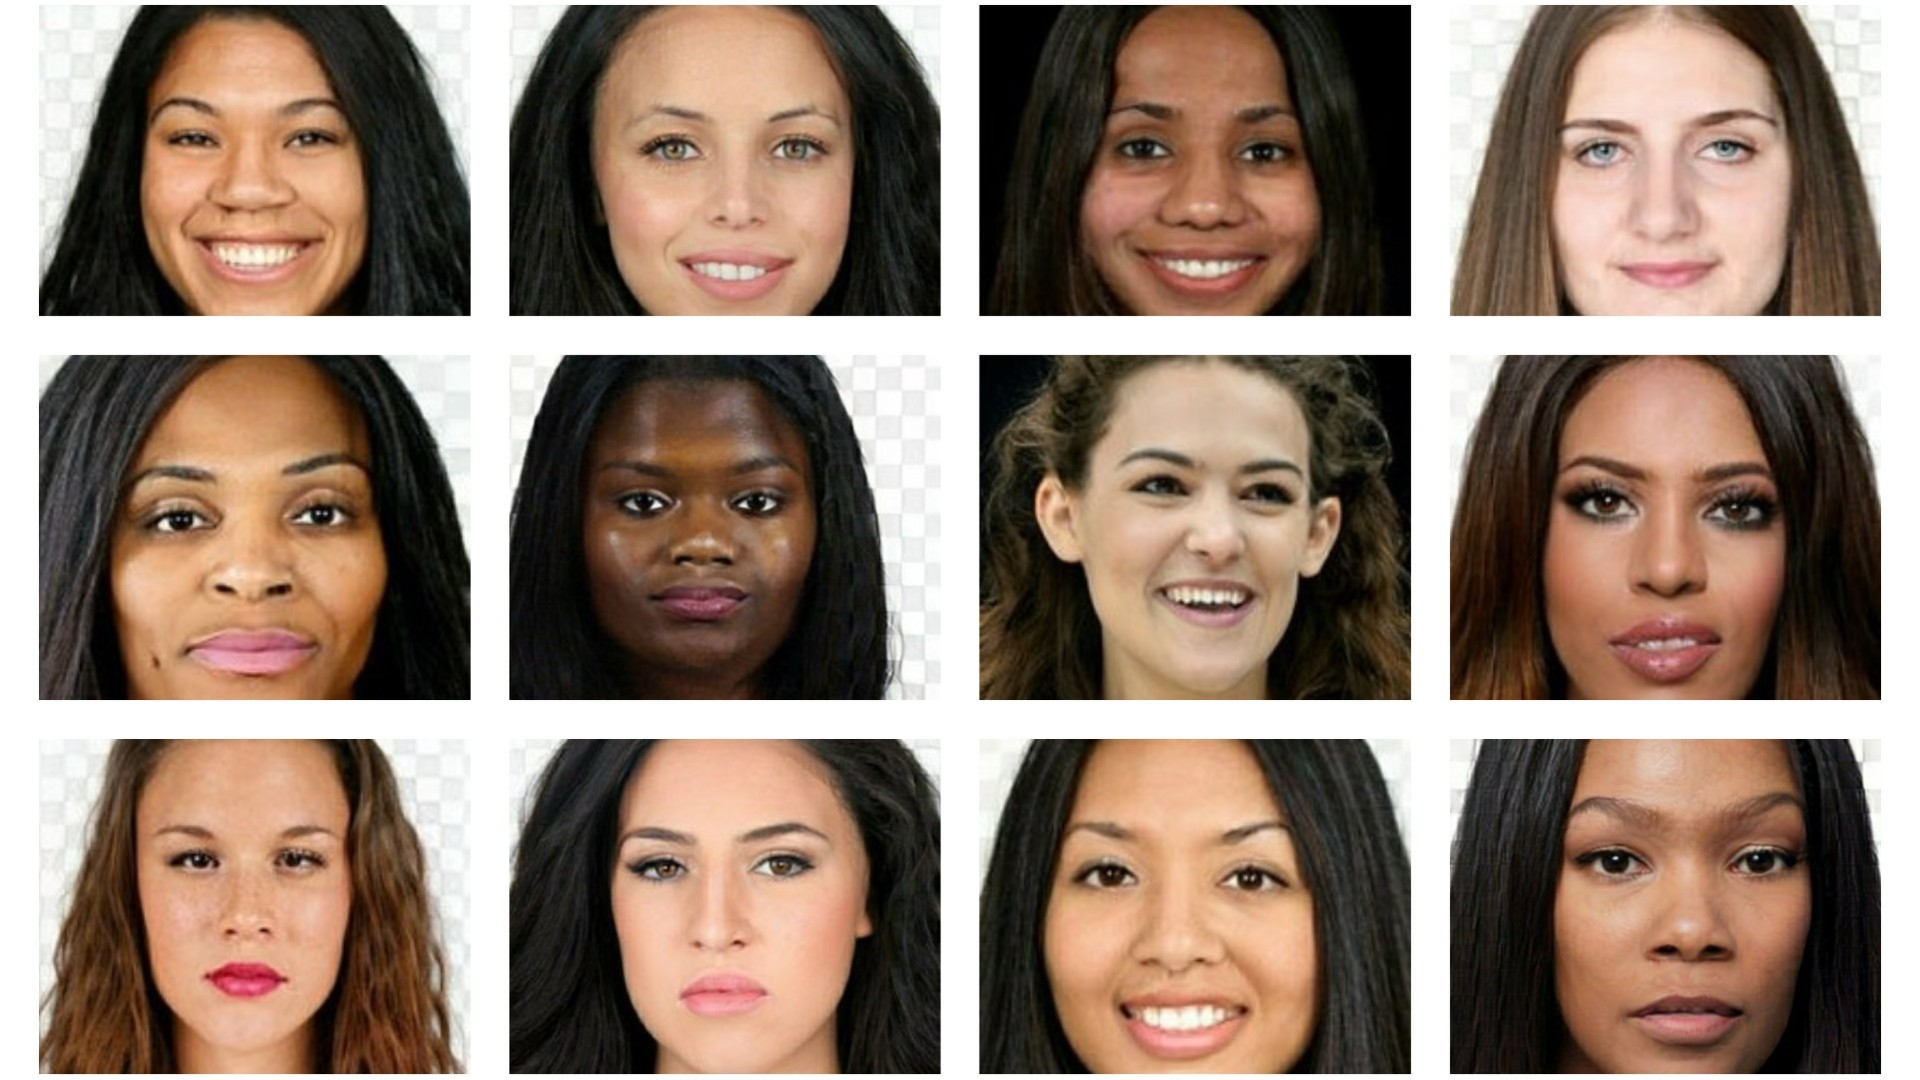 NBA stars as women